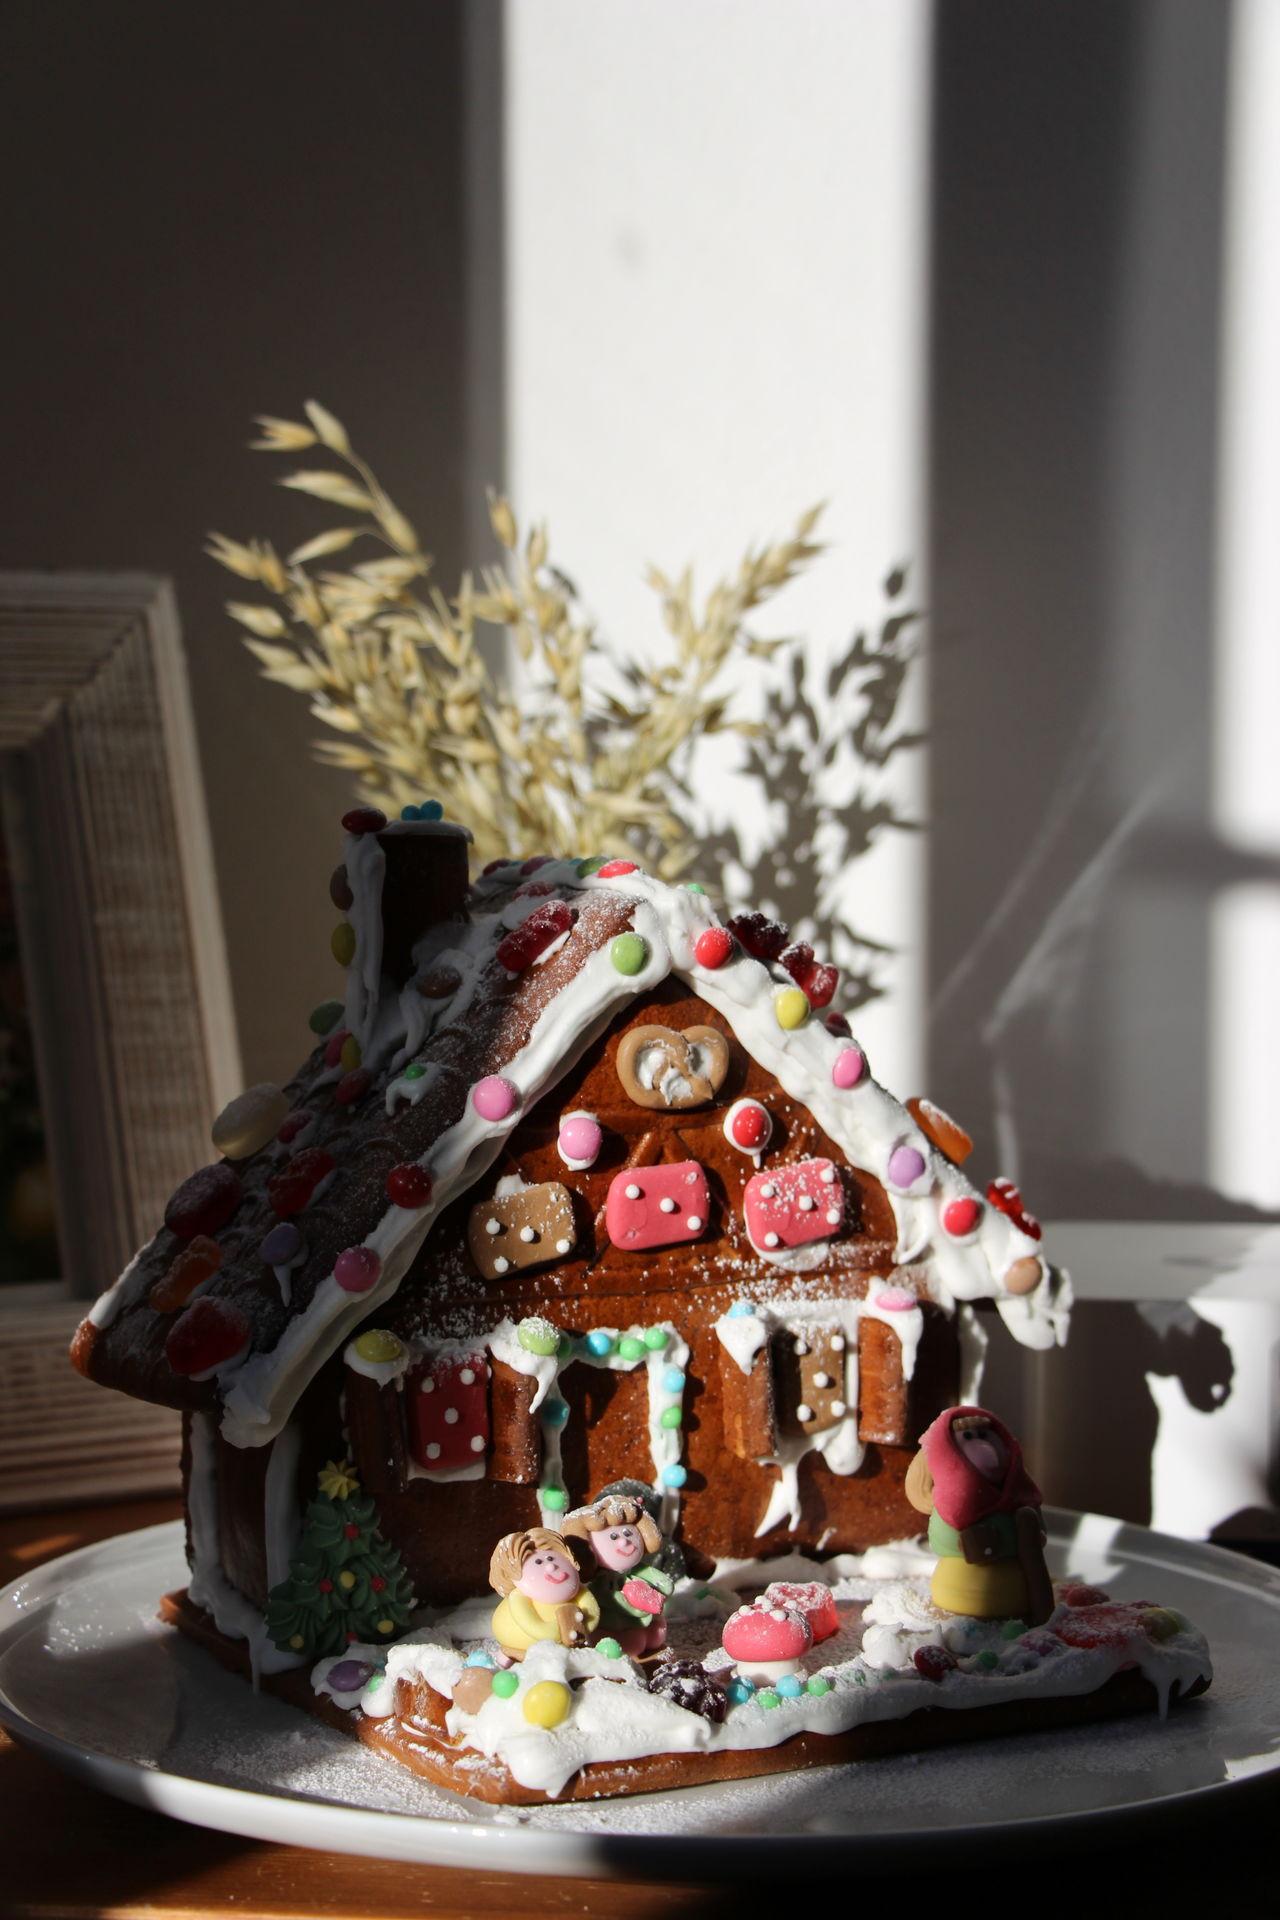 Christmas December Dezember Ginger Gingerbreadhouse Lebkuchen Lebkuchenhaus Sonnenstrahlen Sunlight Sweets Süßigkeiten Tradition Weihnachten Zucker